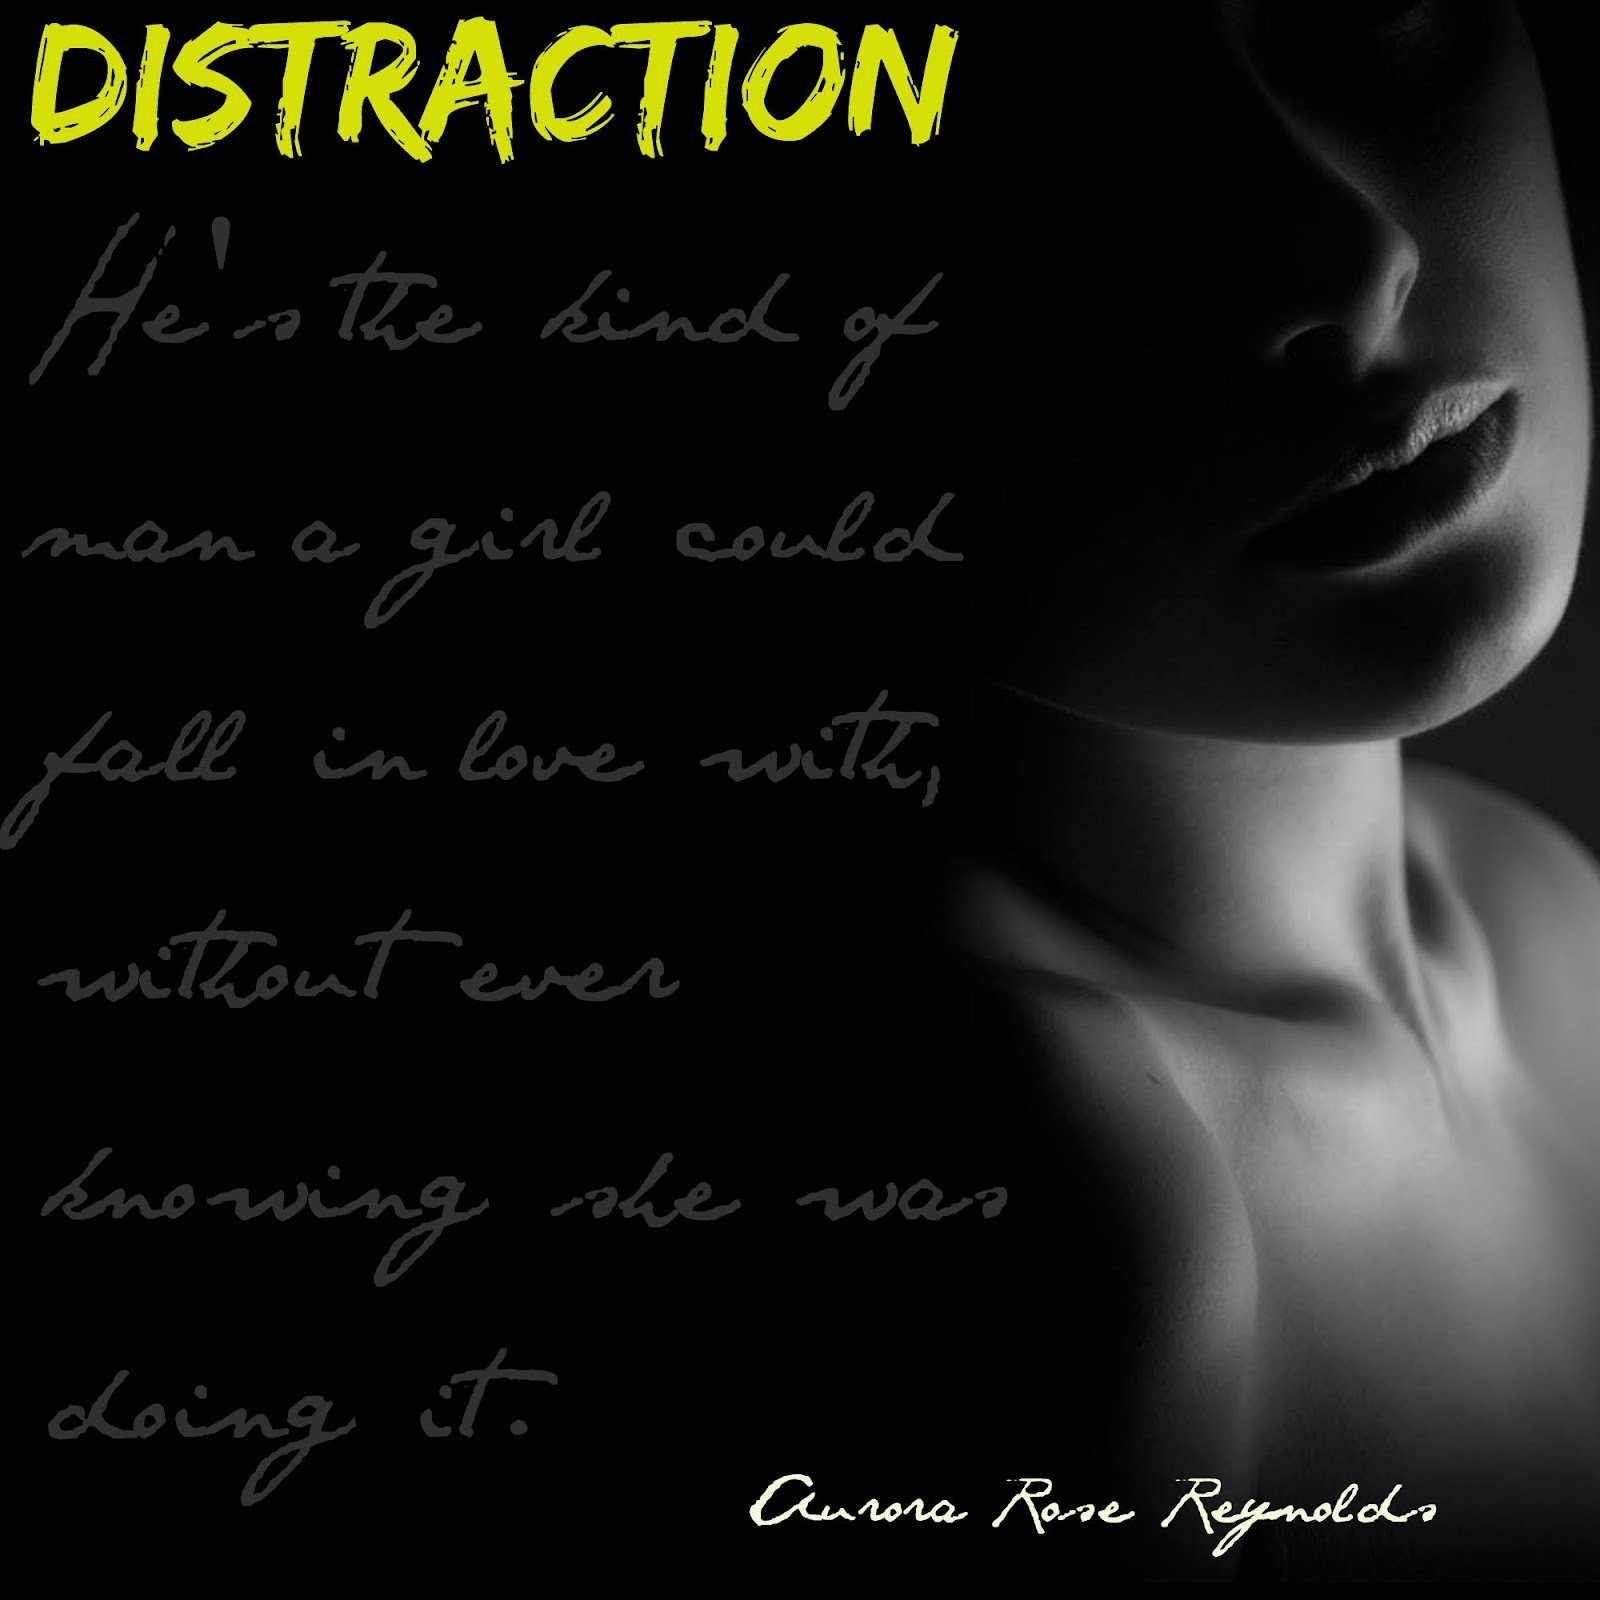 distraction teaser 3.jpg